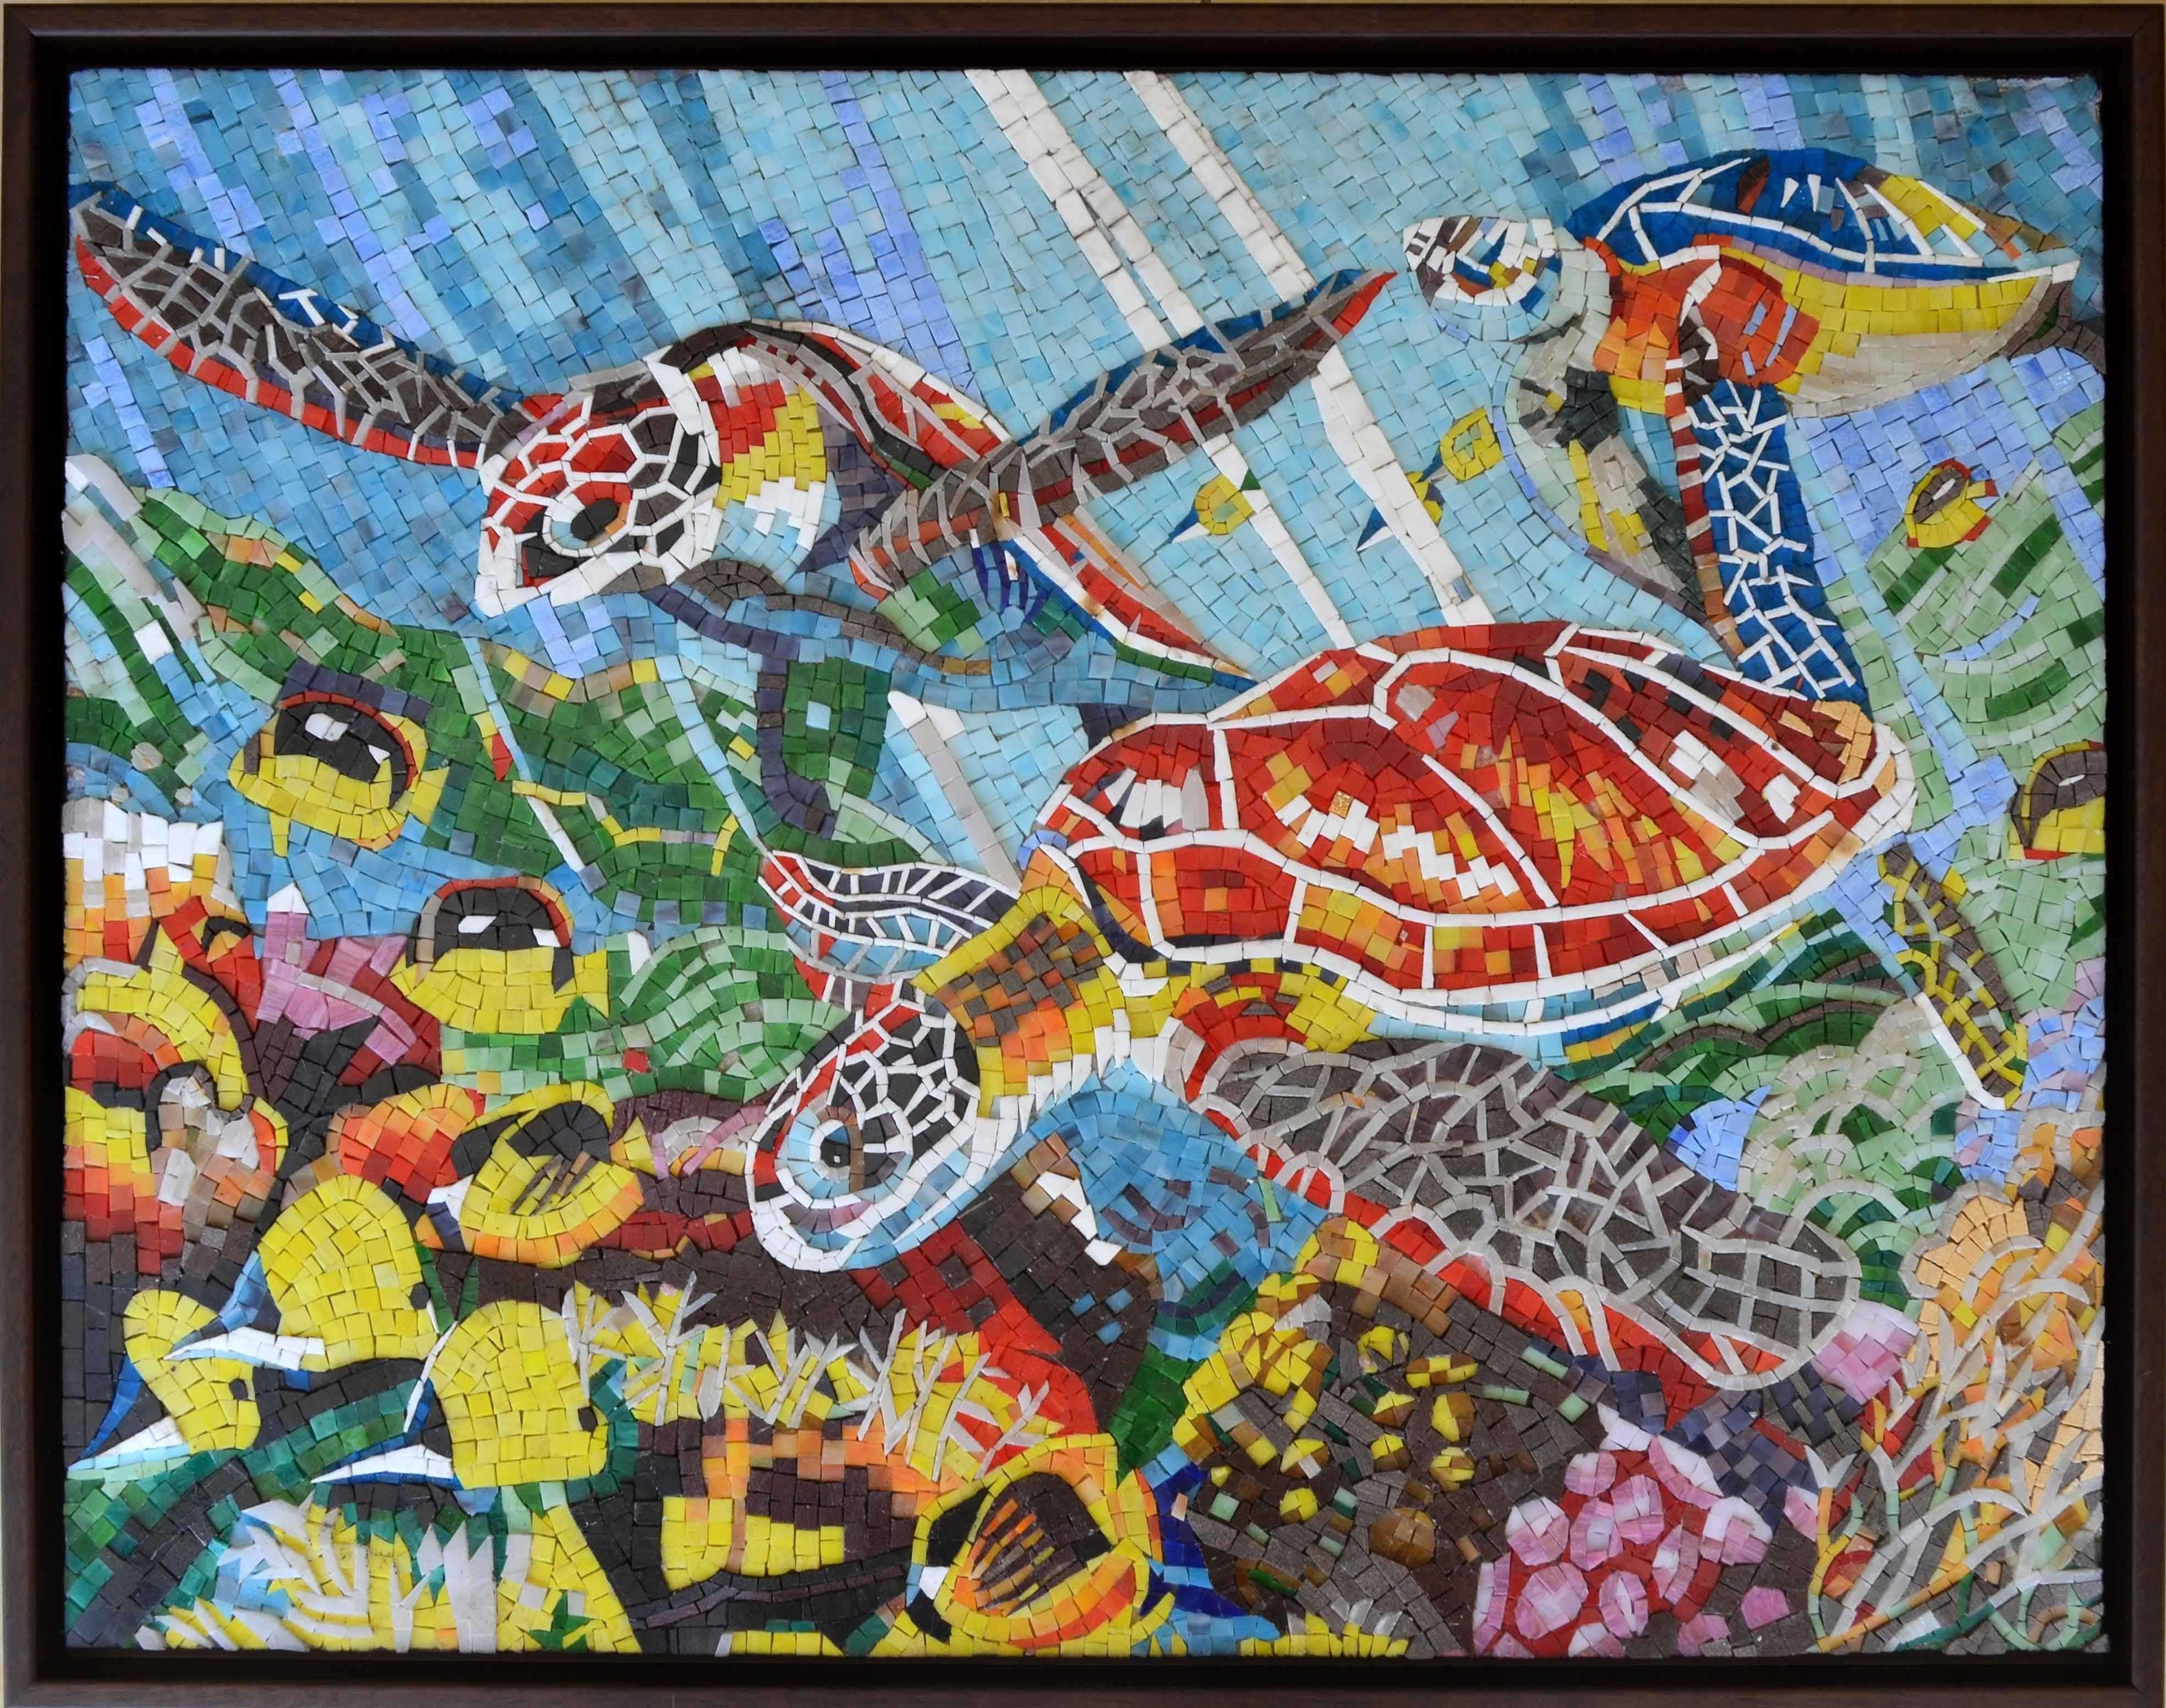 Colorful sea turtles and fish glass mosaic mural mosaic